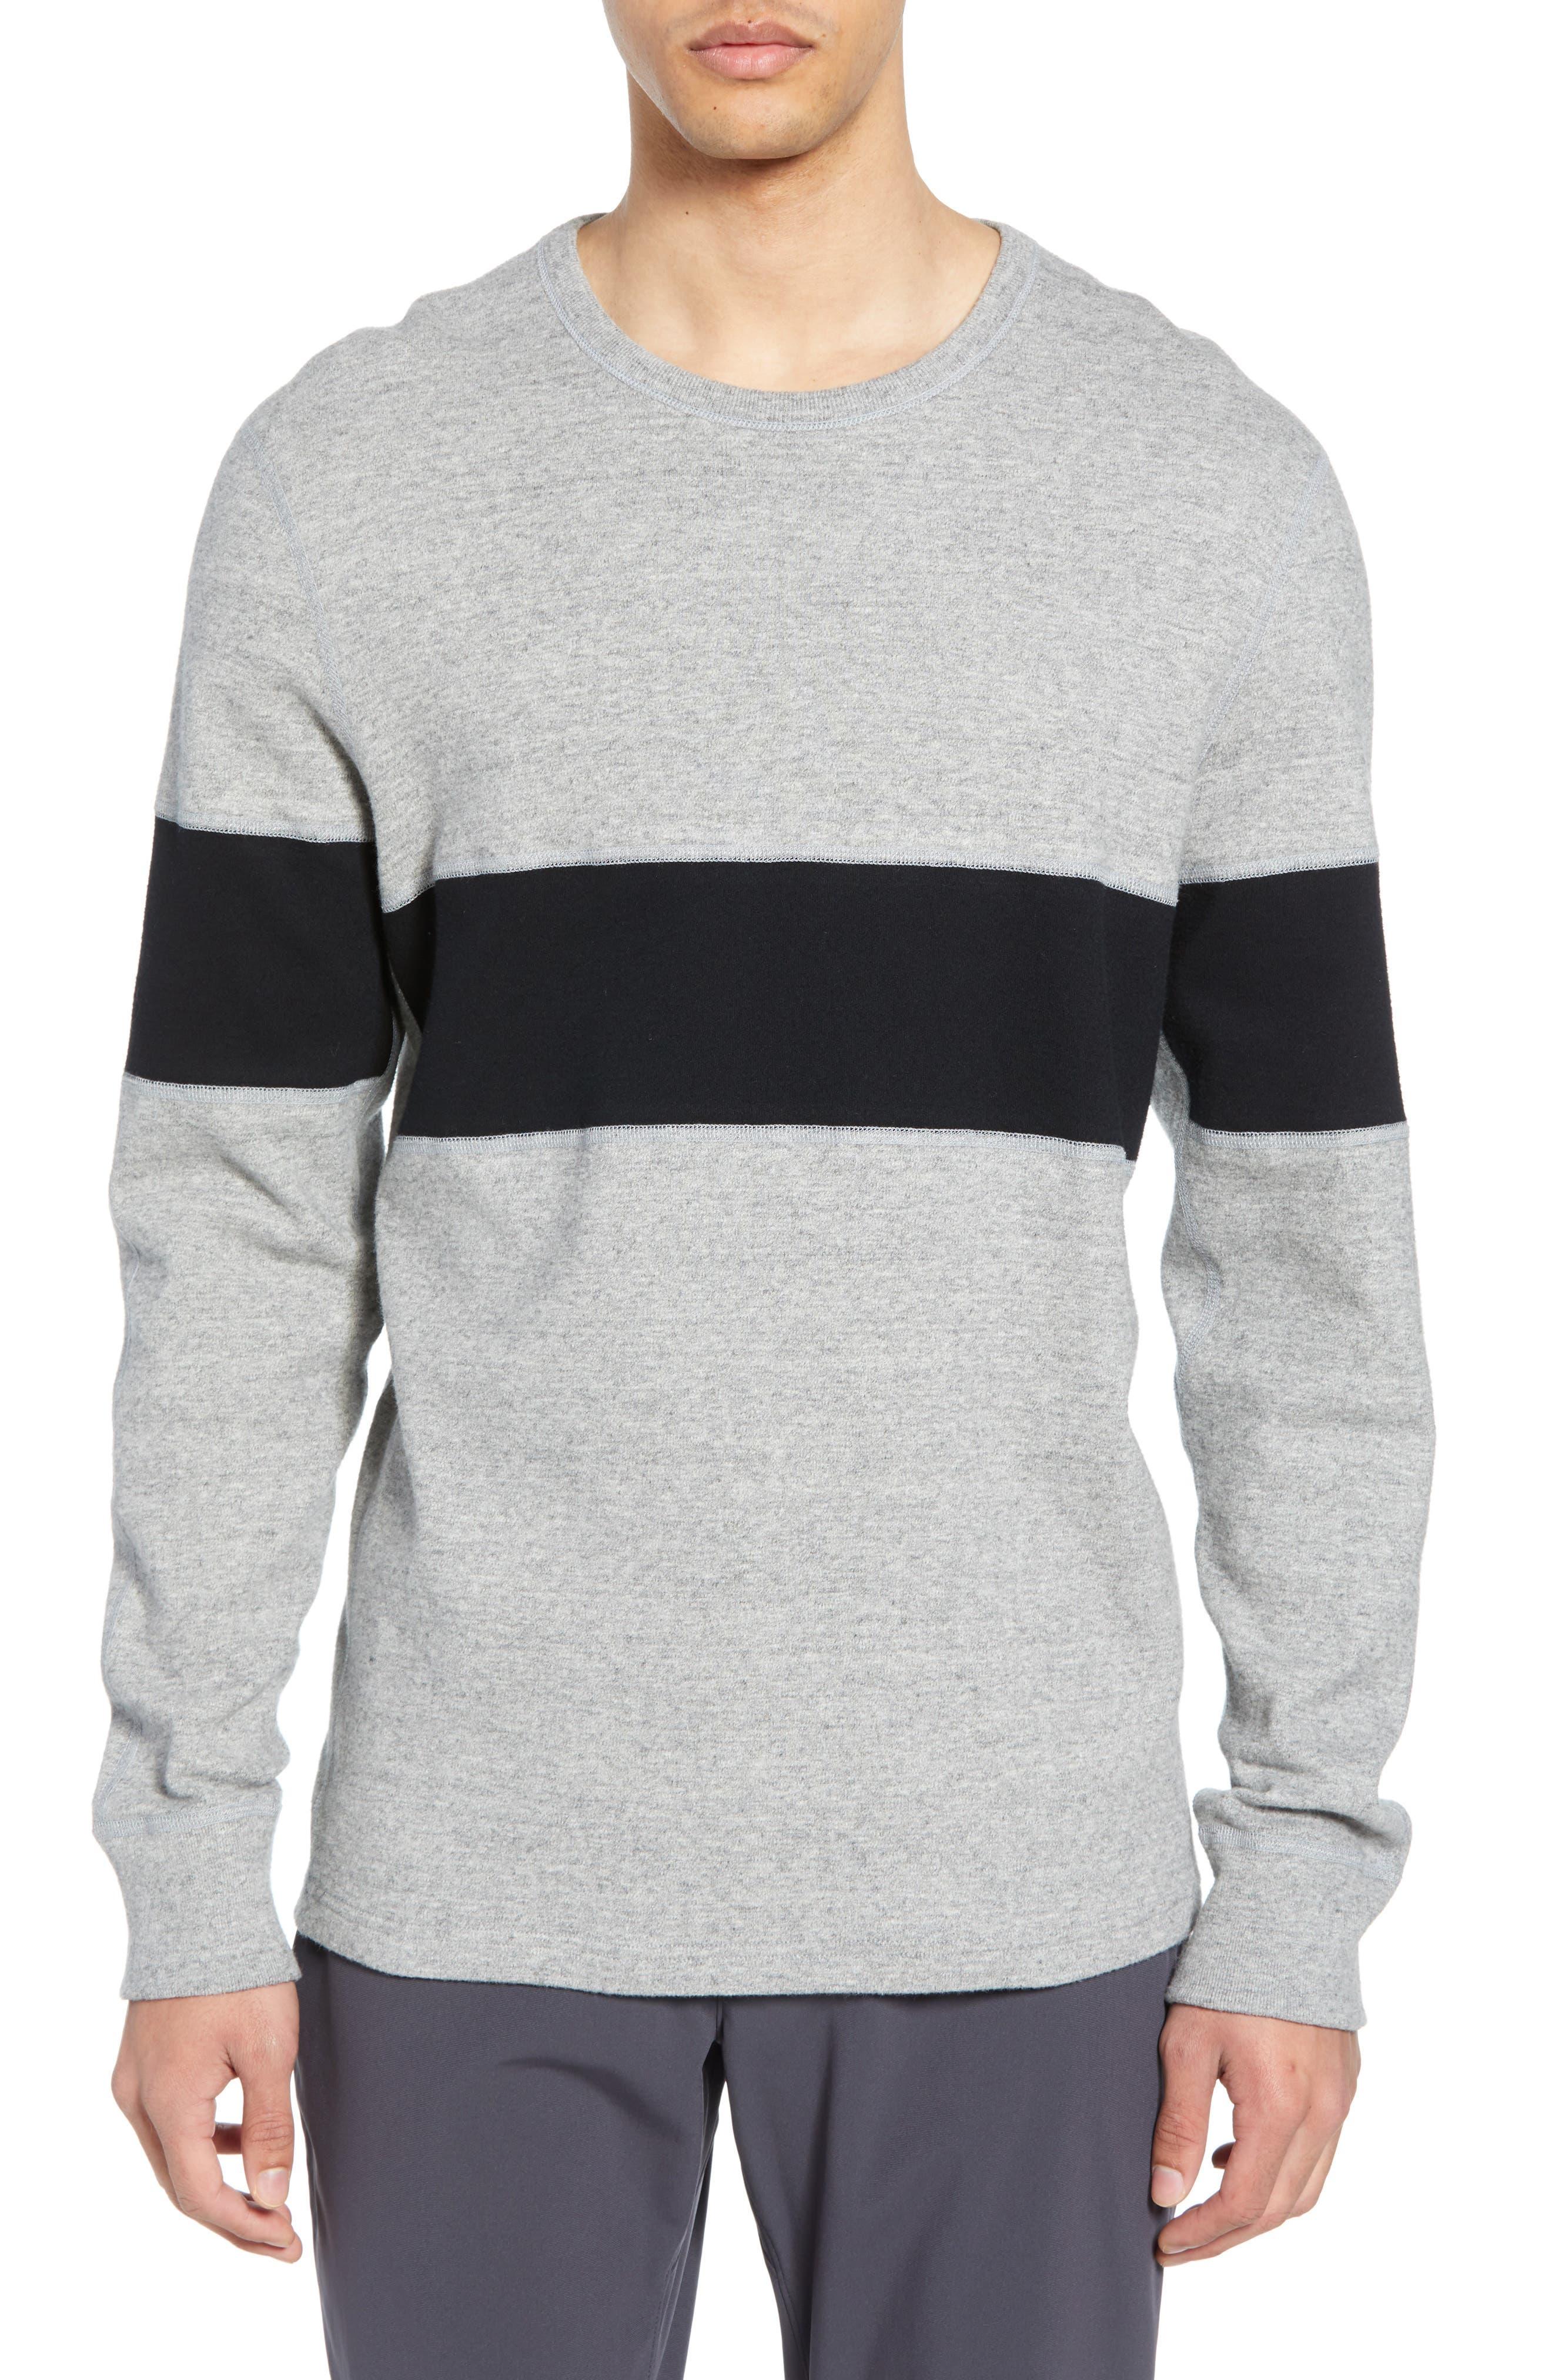 REIGNING CHAMP, Rugby Crewneck Sweatshirt, Main thumbnail 1, color, MEDIUM GREY/ BLACK